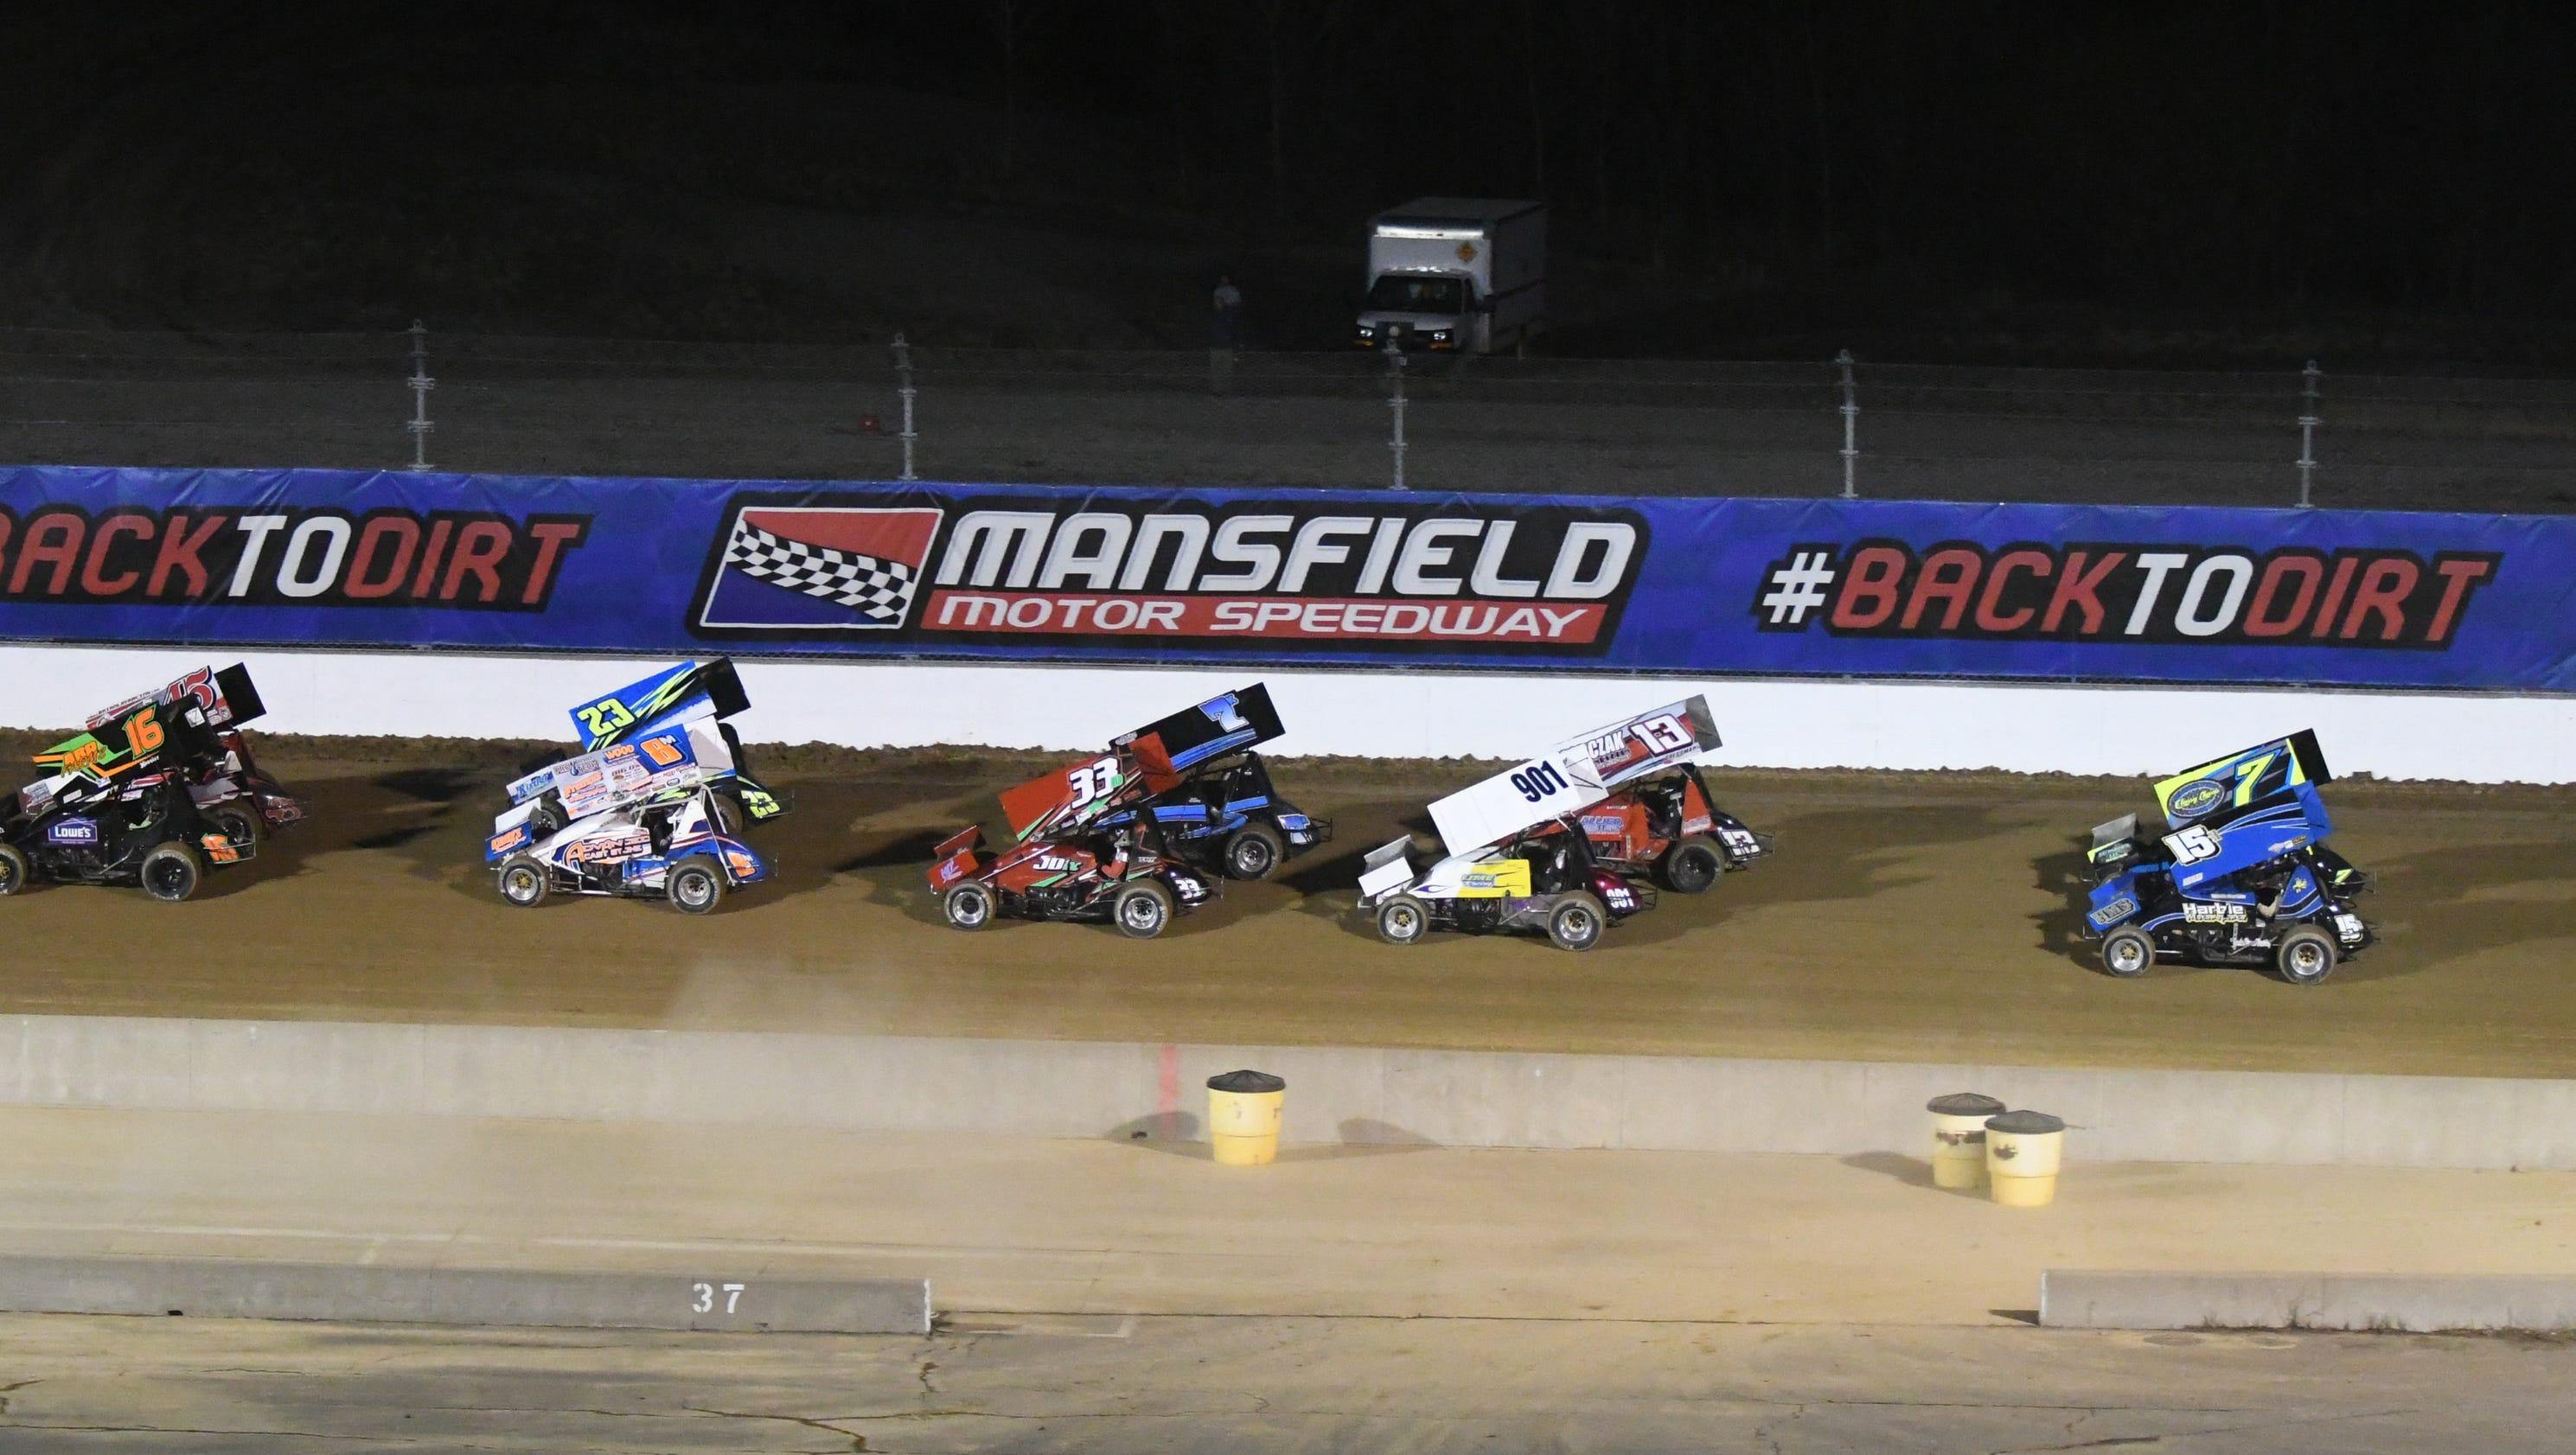 Mansfield Motor Speedway Sprint Car Race